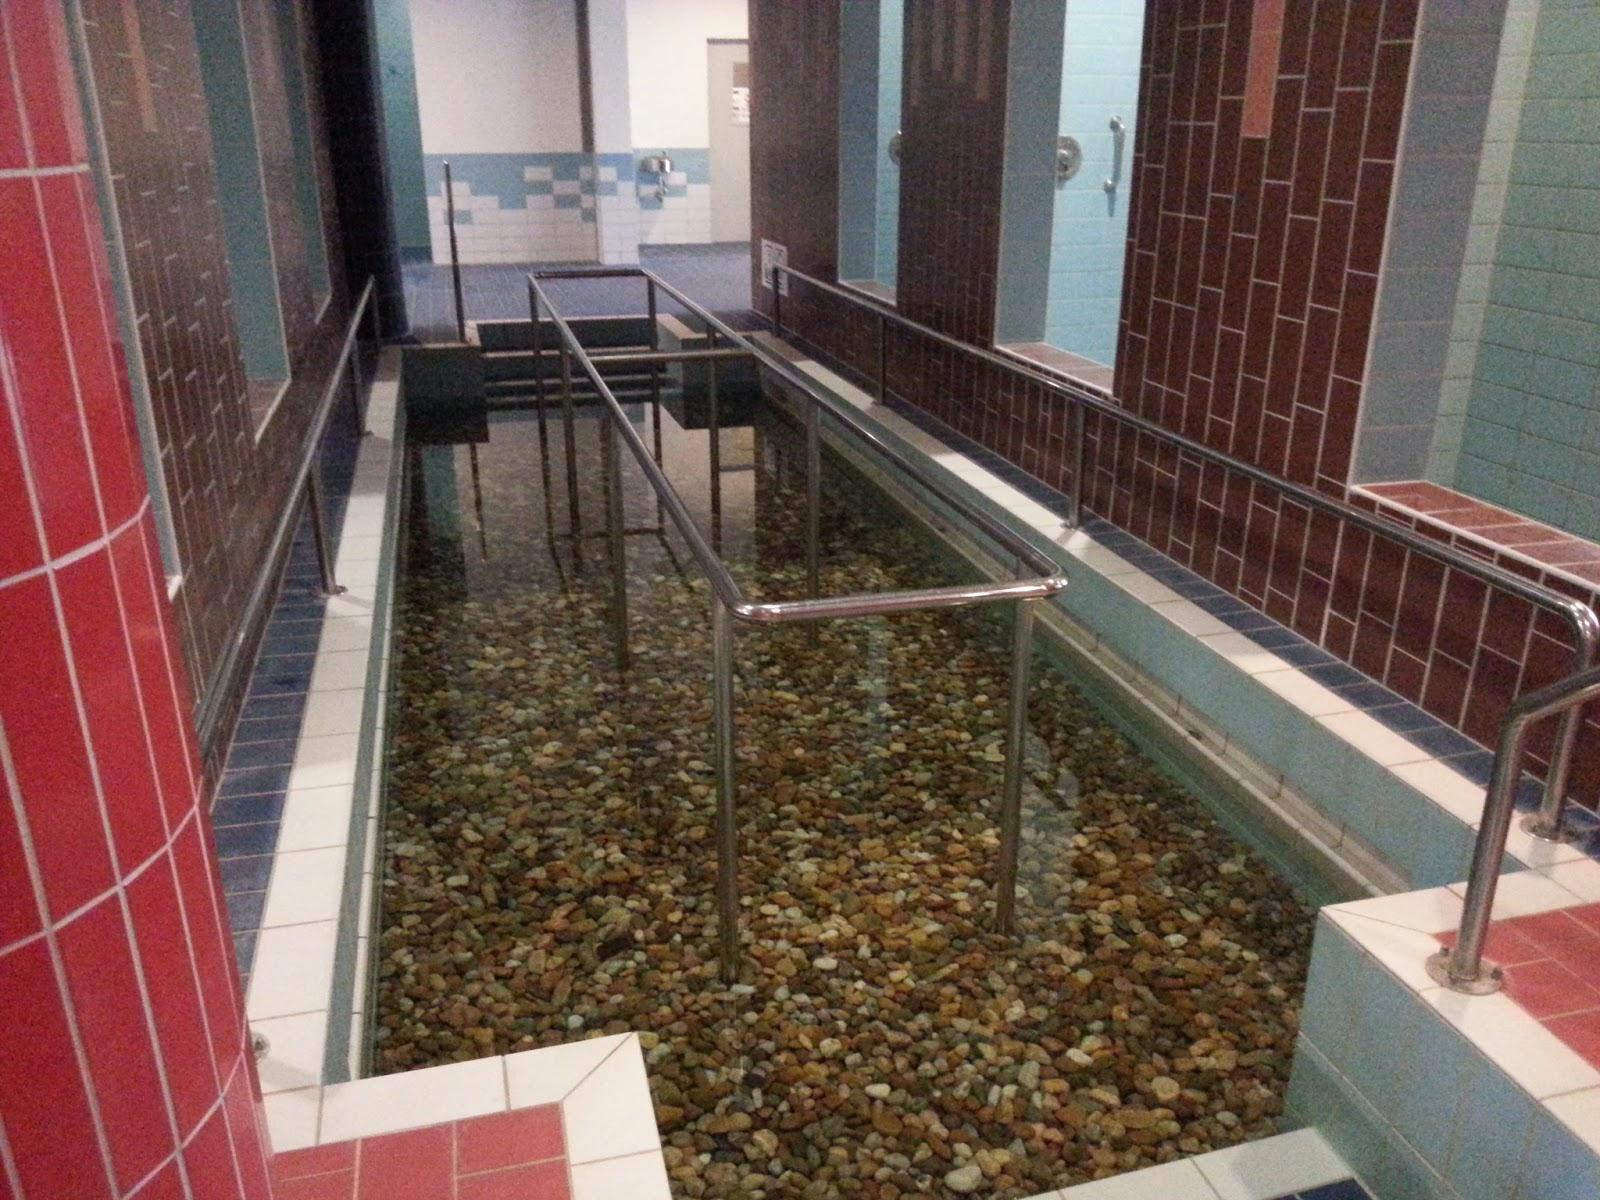 Hungary Adoption Adventures: The Hungarian Baths